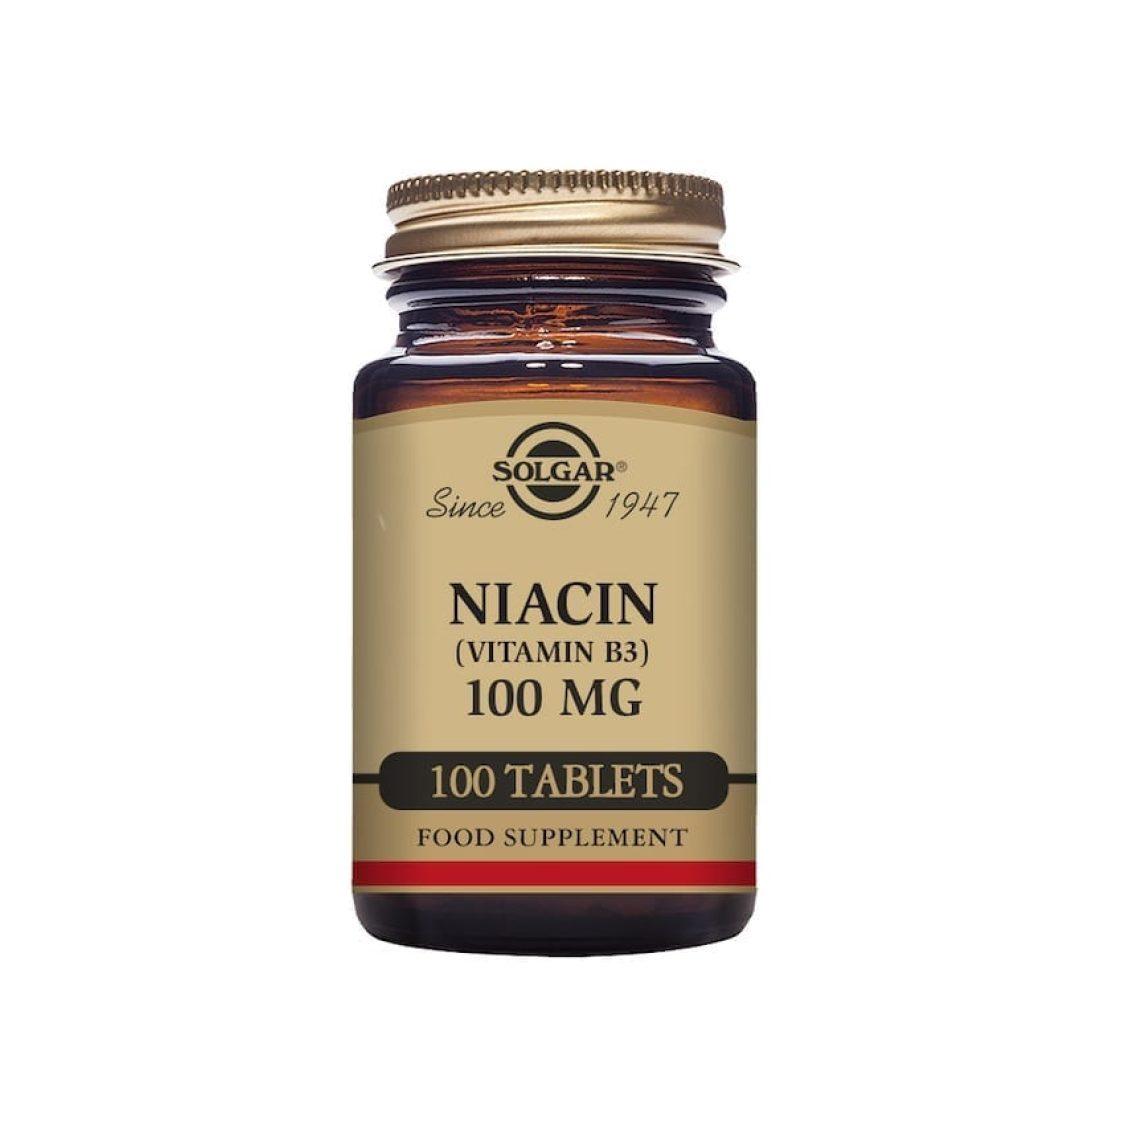 Solgar - Vitamin B - Niacin Tabs 100mg    - Size: 100